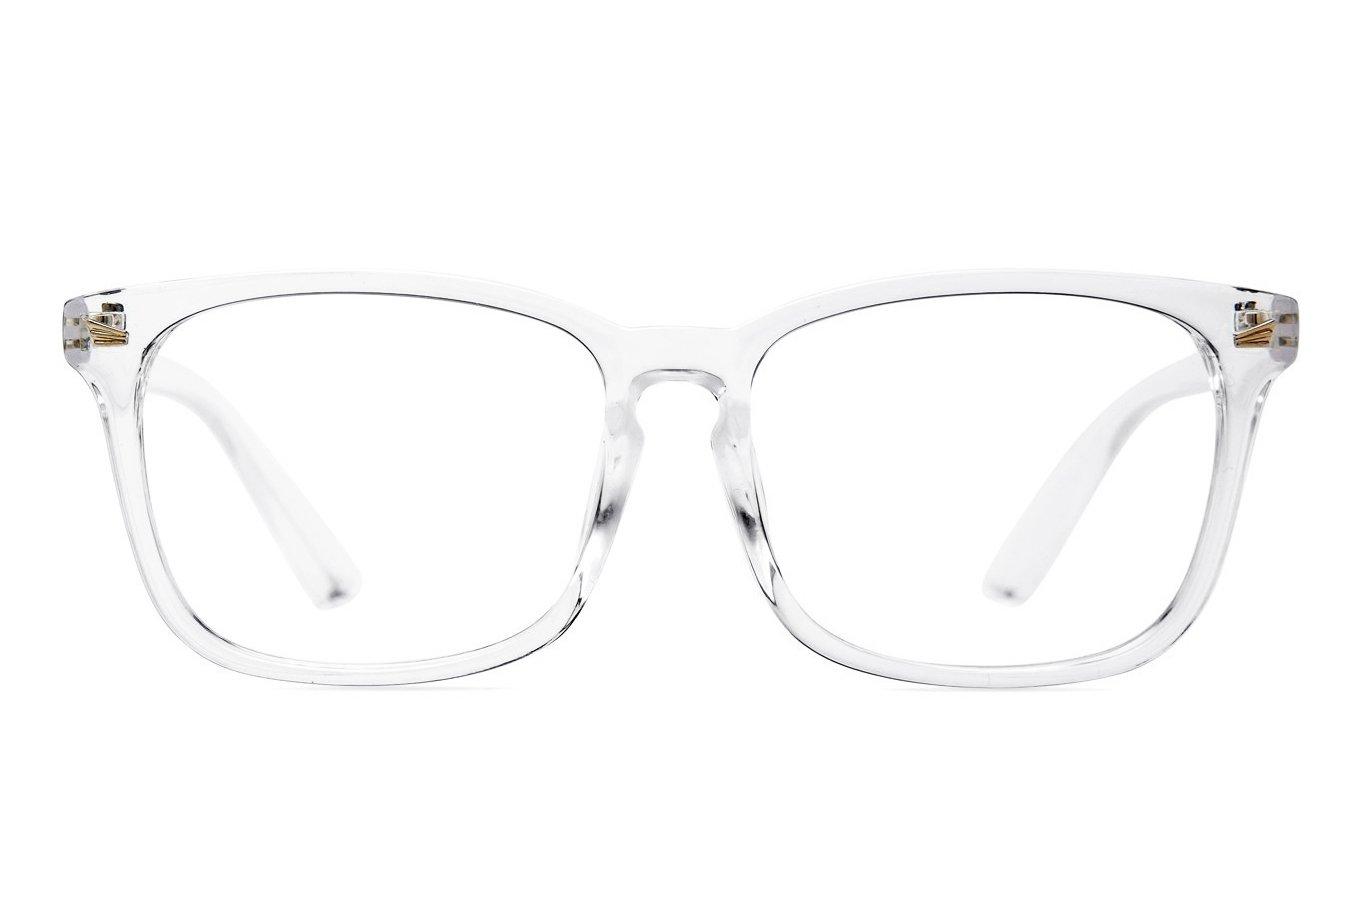 Plain Glasses Frame Eyeglasses Clear Lens Transparent 53mm Frames ...